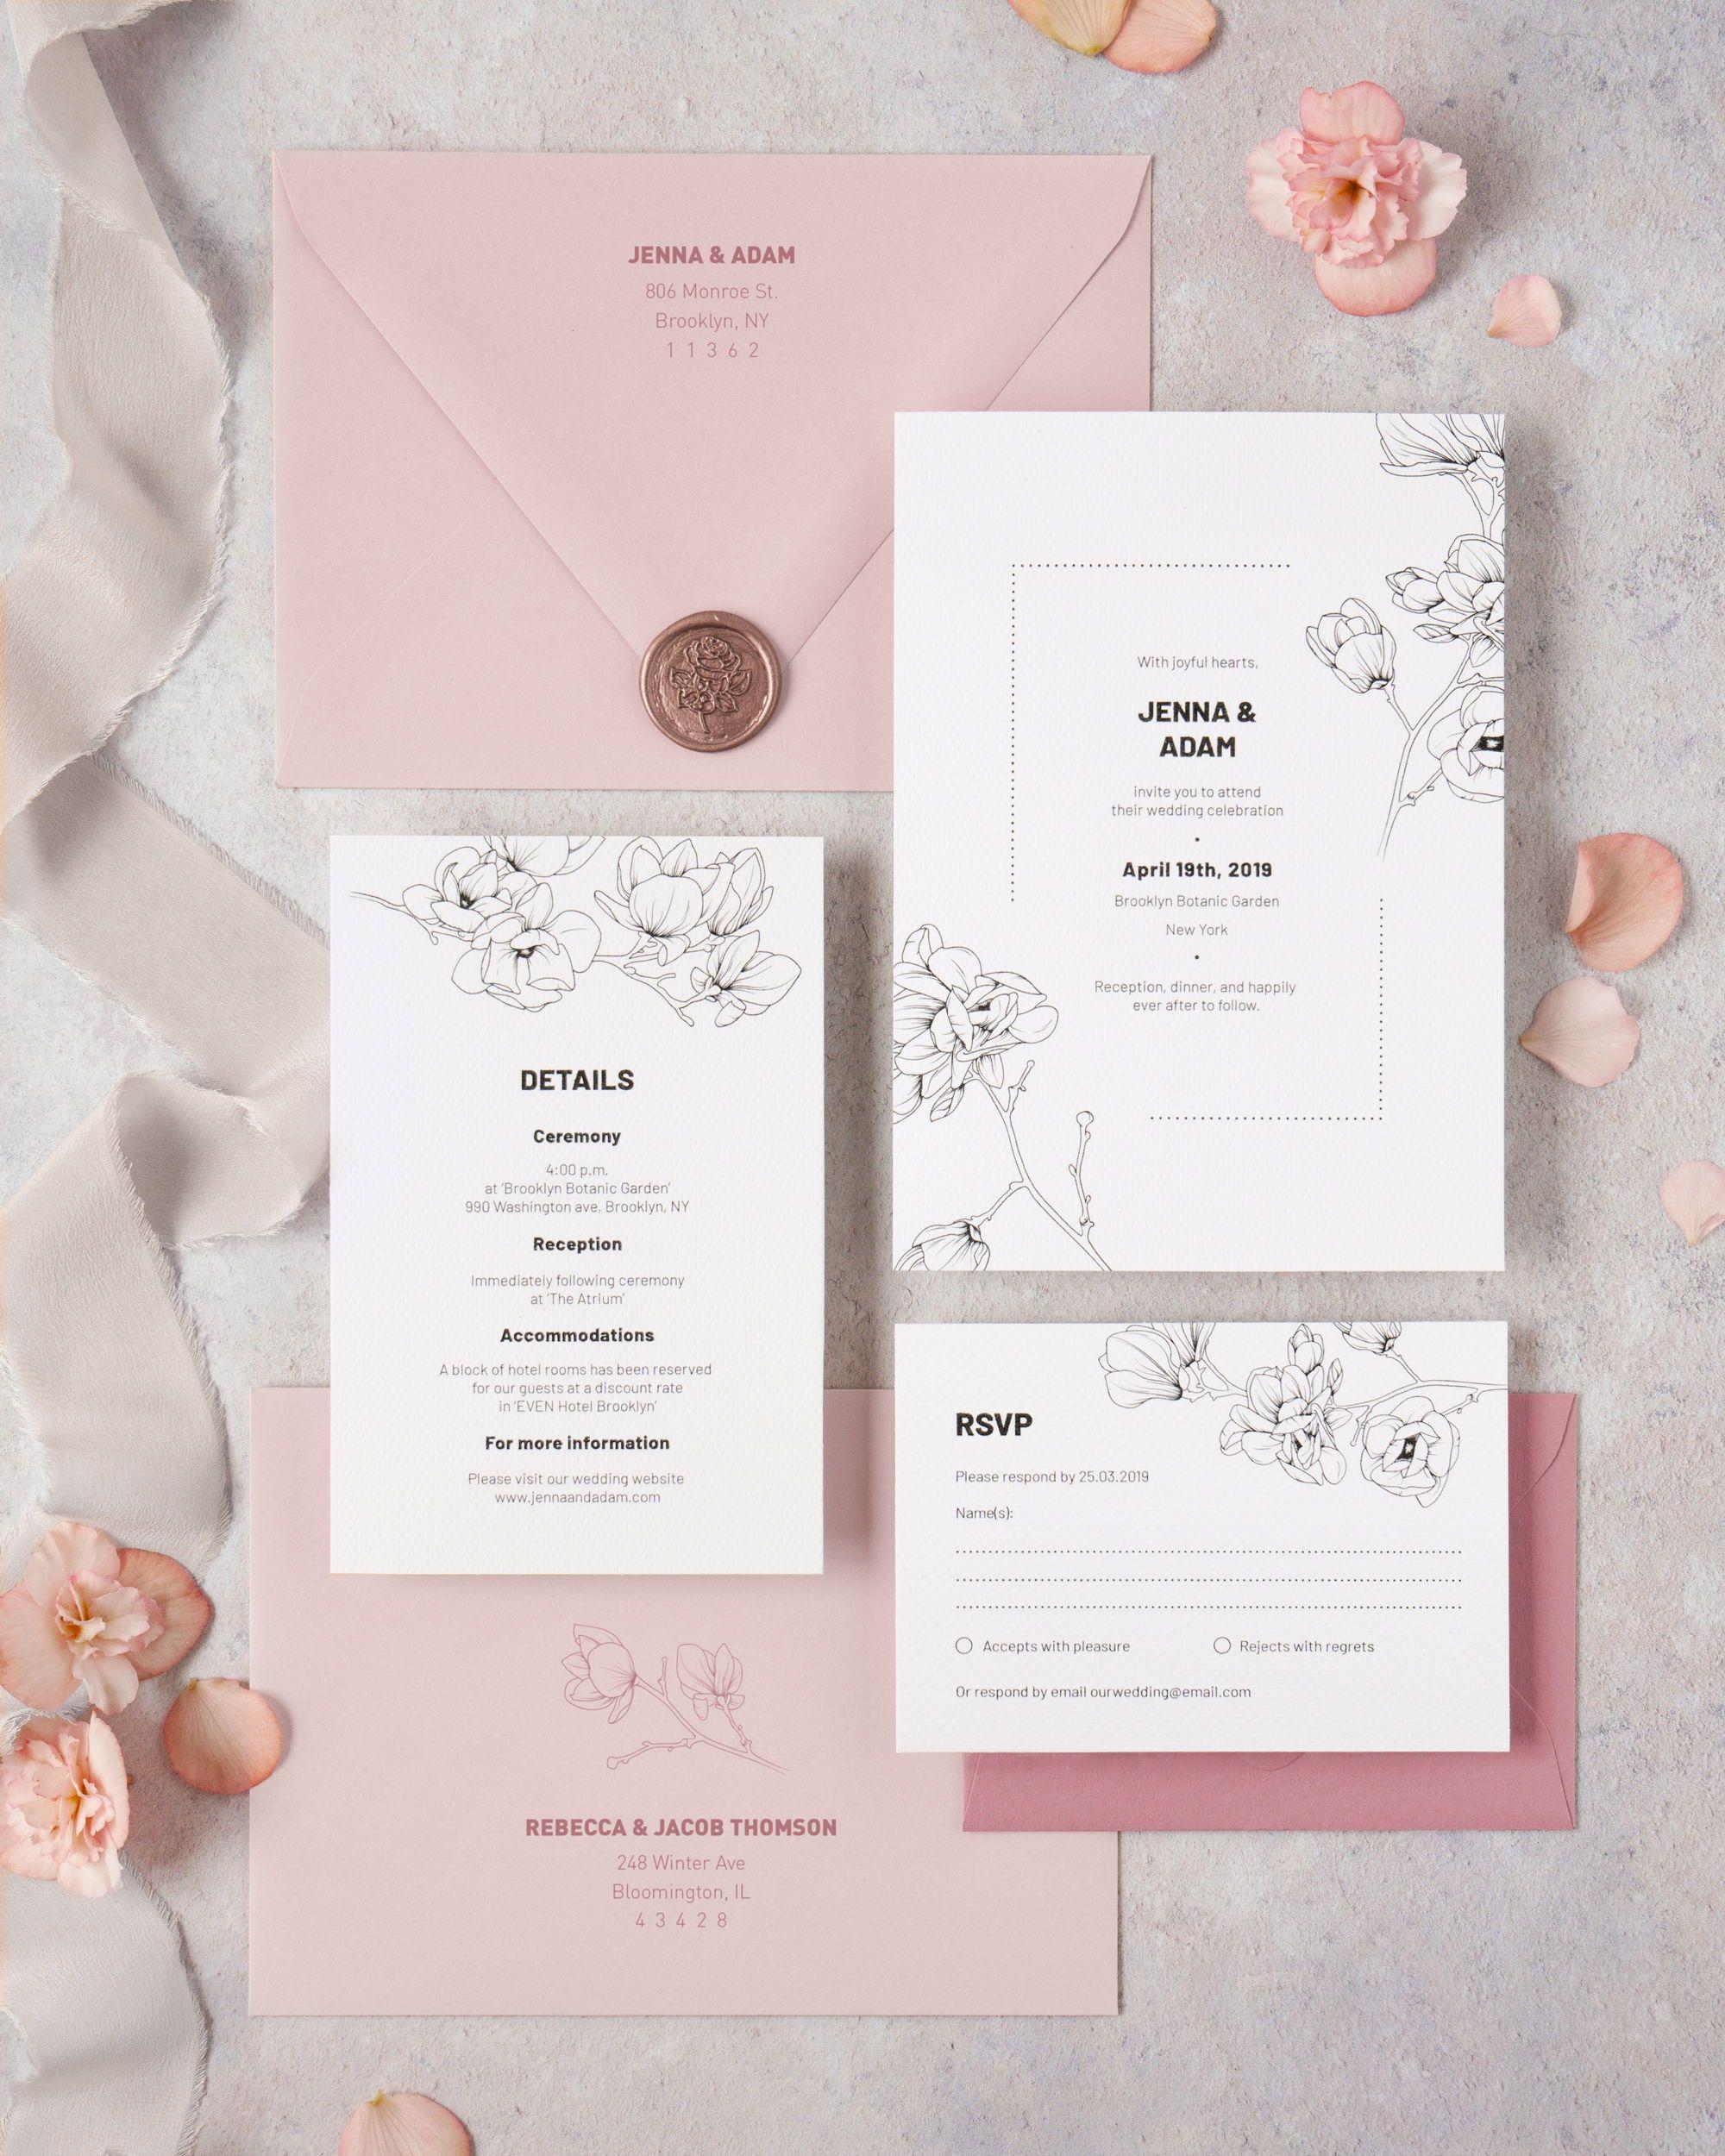 Wedding Invitations With Magnolia Flowers Wedding Invitations Spring Wedding Favors Wedding Invitation Design